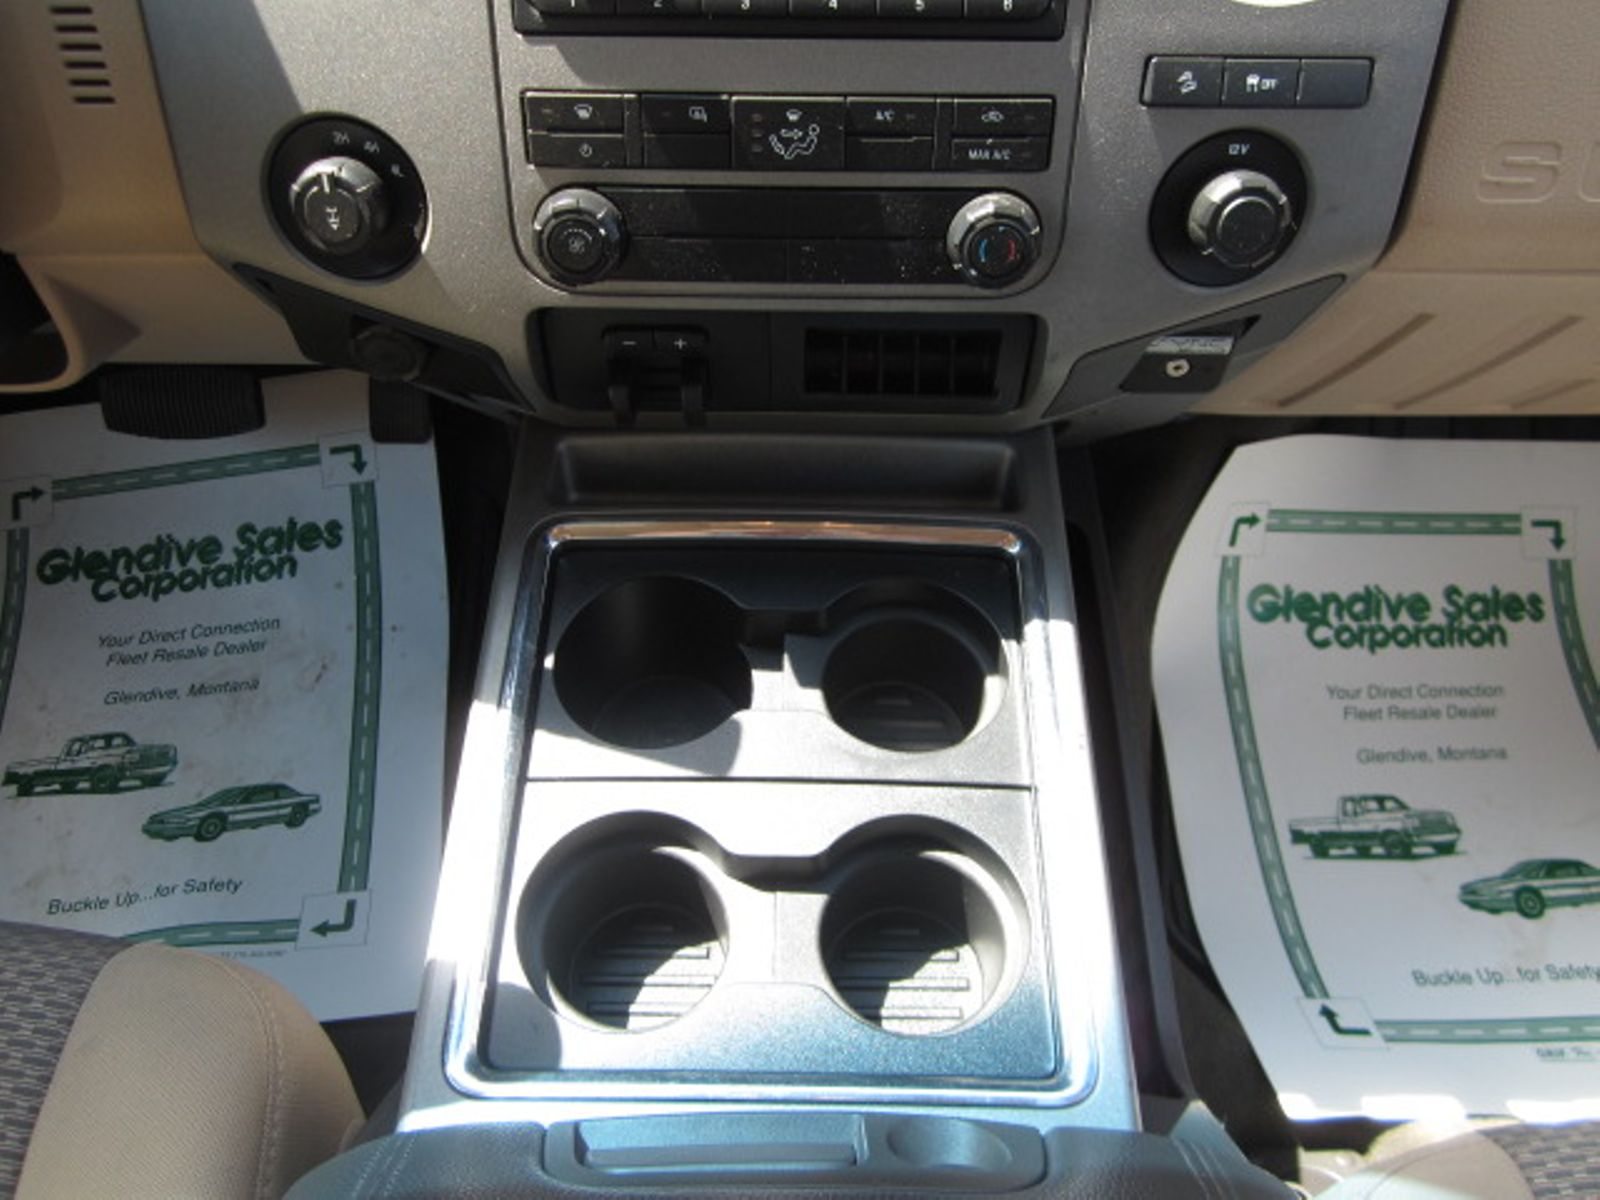 hight resolution of  2011 ford super duty f 350 srw pickup xlt glendive mt glendive sales corp in